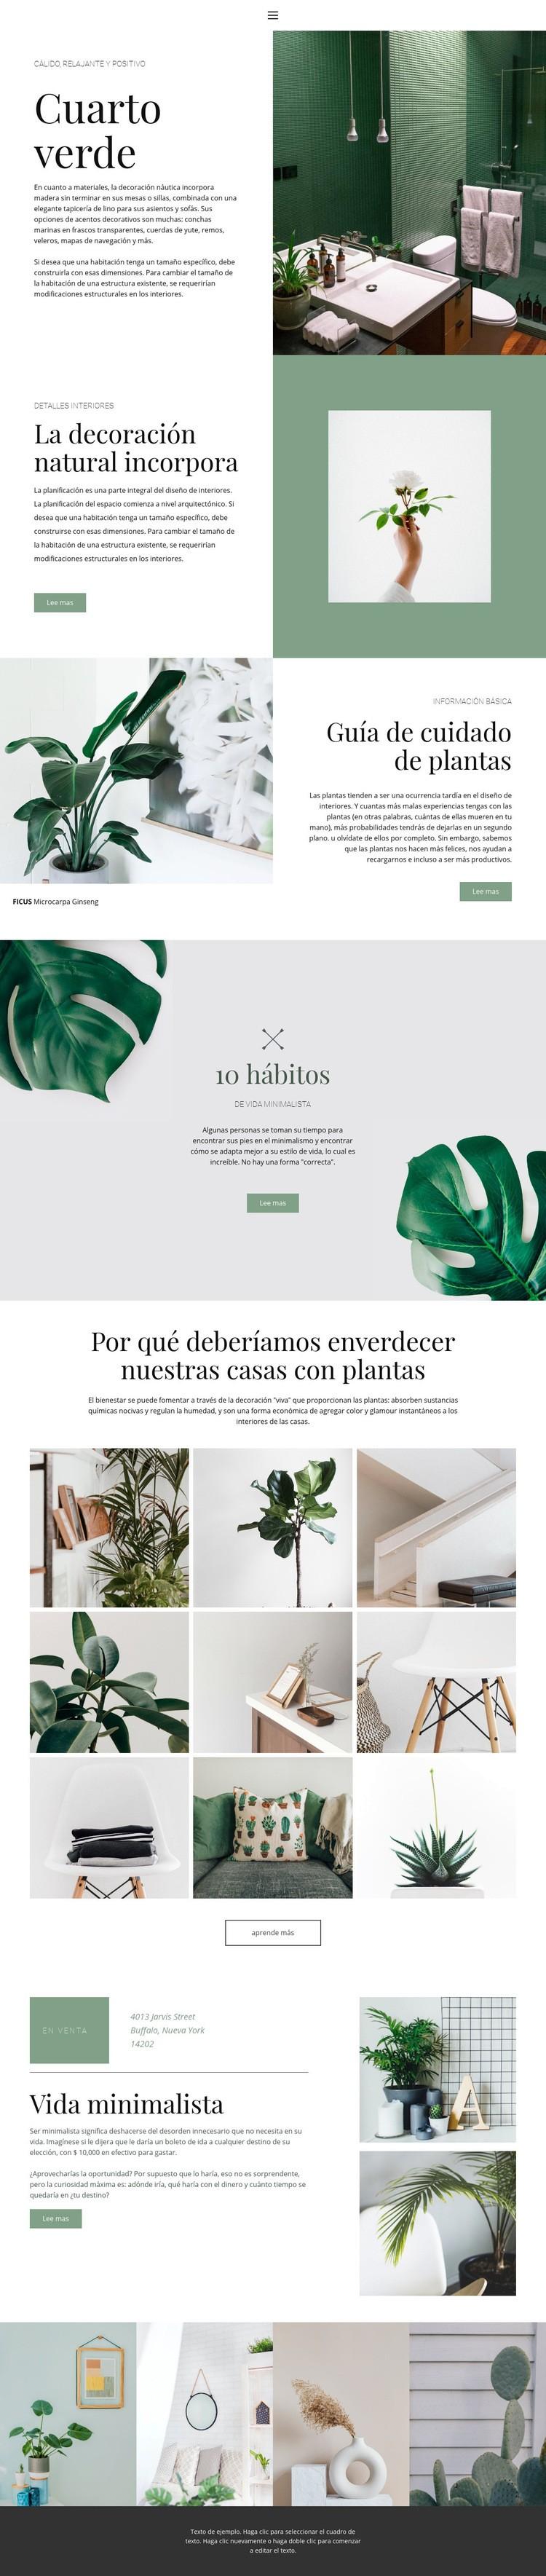 Detalles verdes en casa Plantilla de sitio web